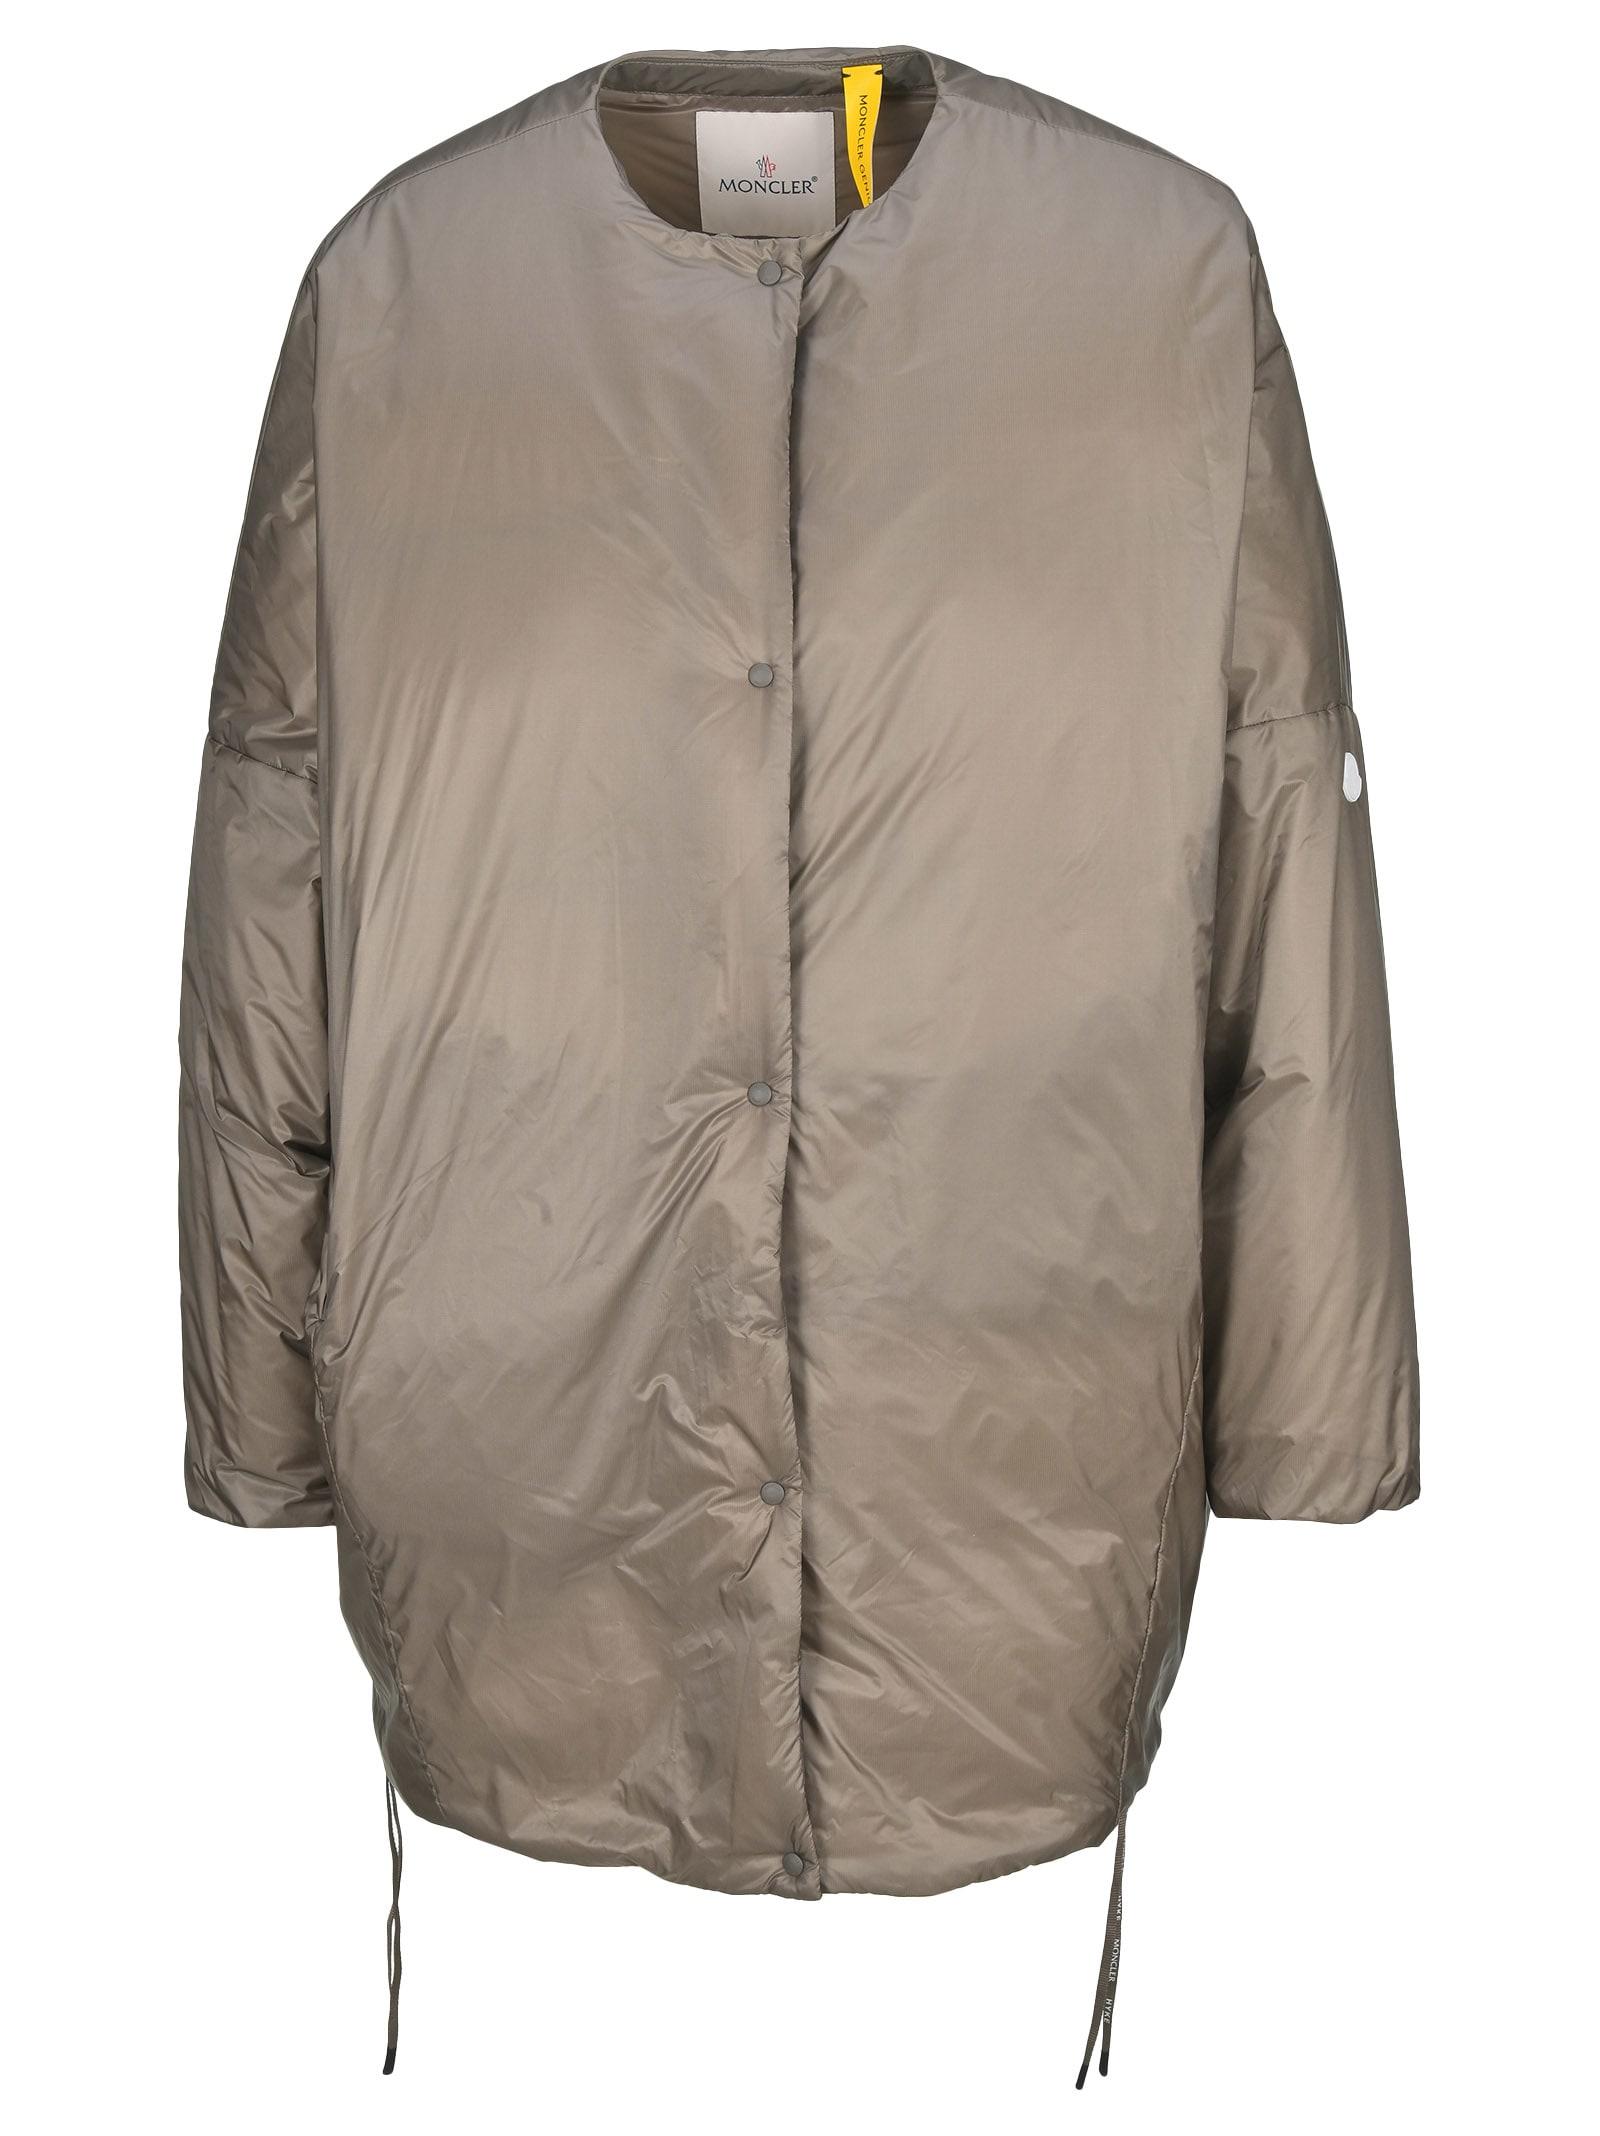 Moncler Hyke Roseg Jacket